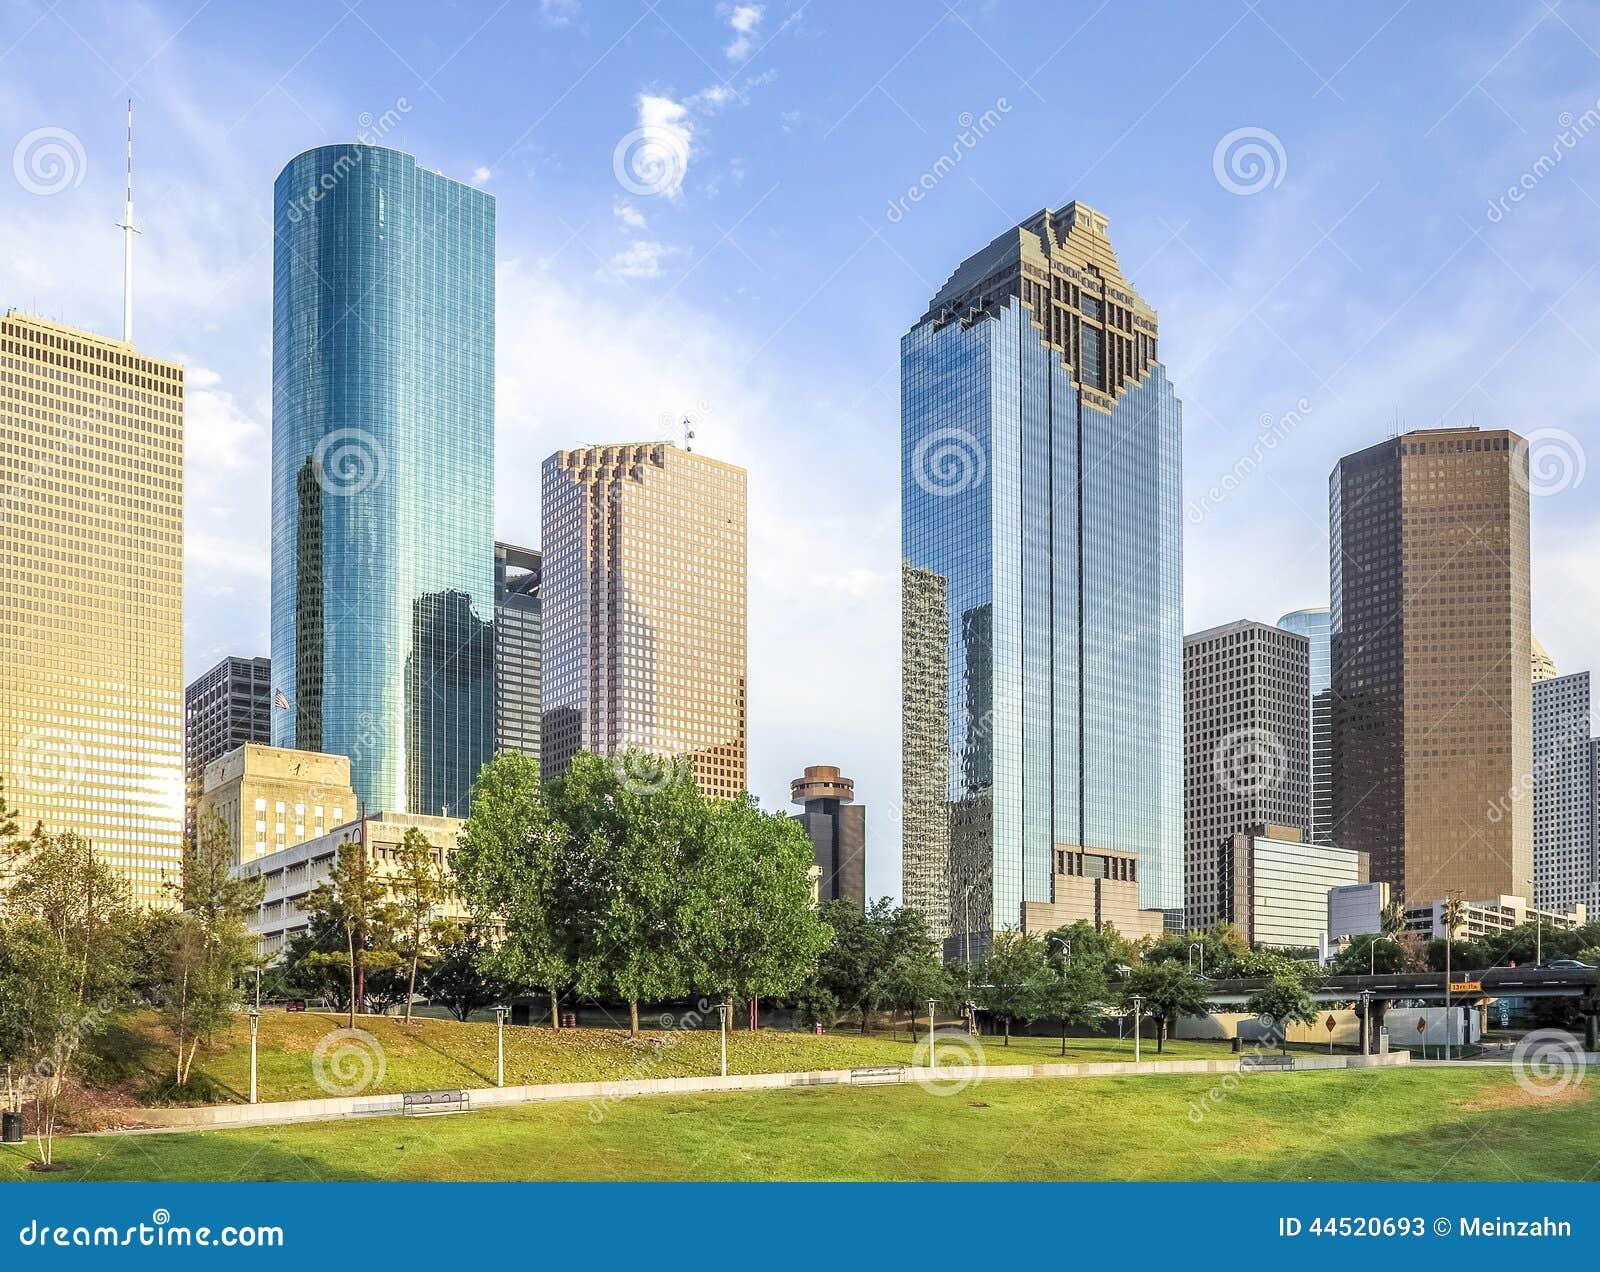 skyline of houston texas stock photo image 44520693. Black Bedroom Furniture Sets. Home Design Ideas